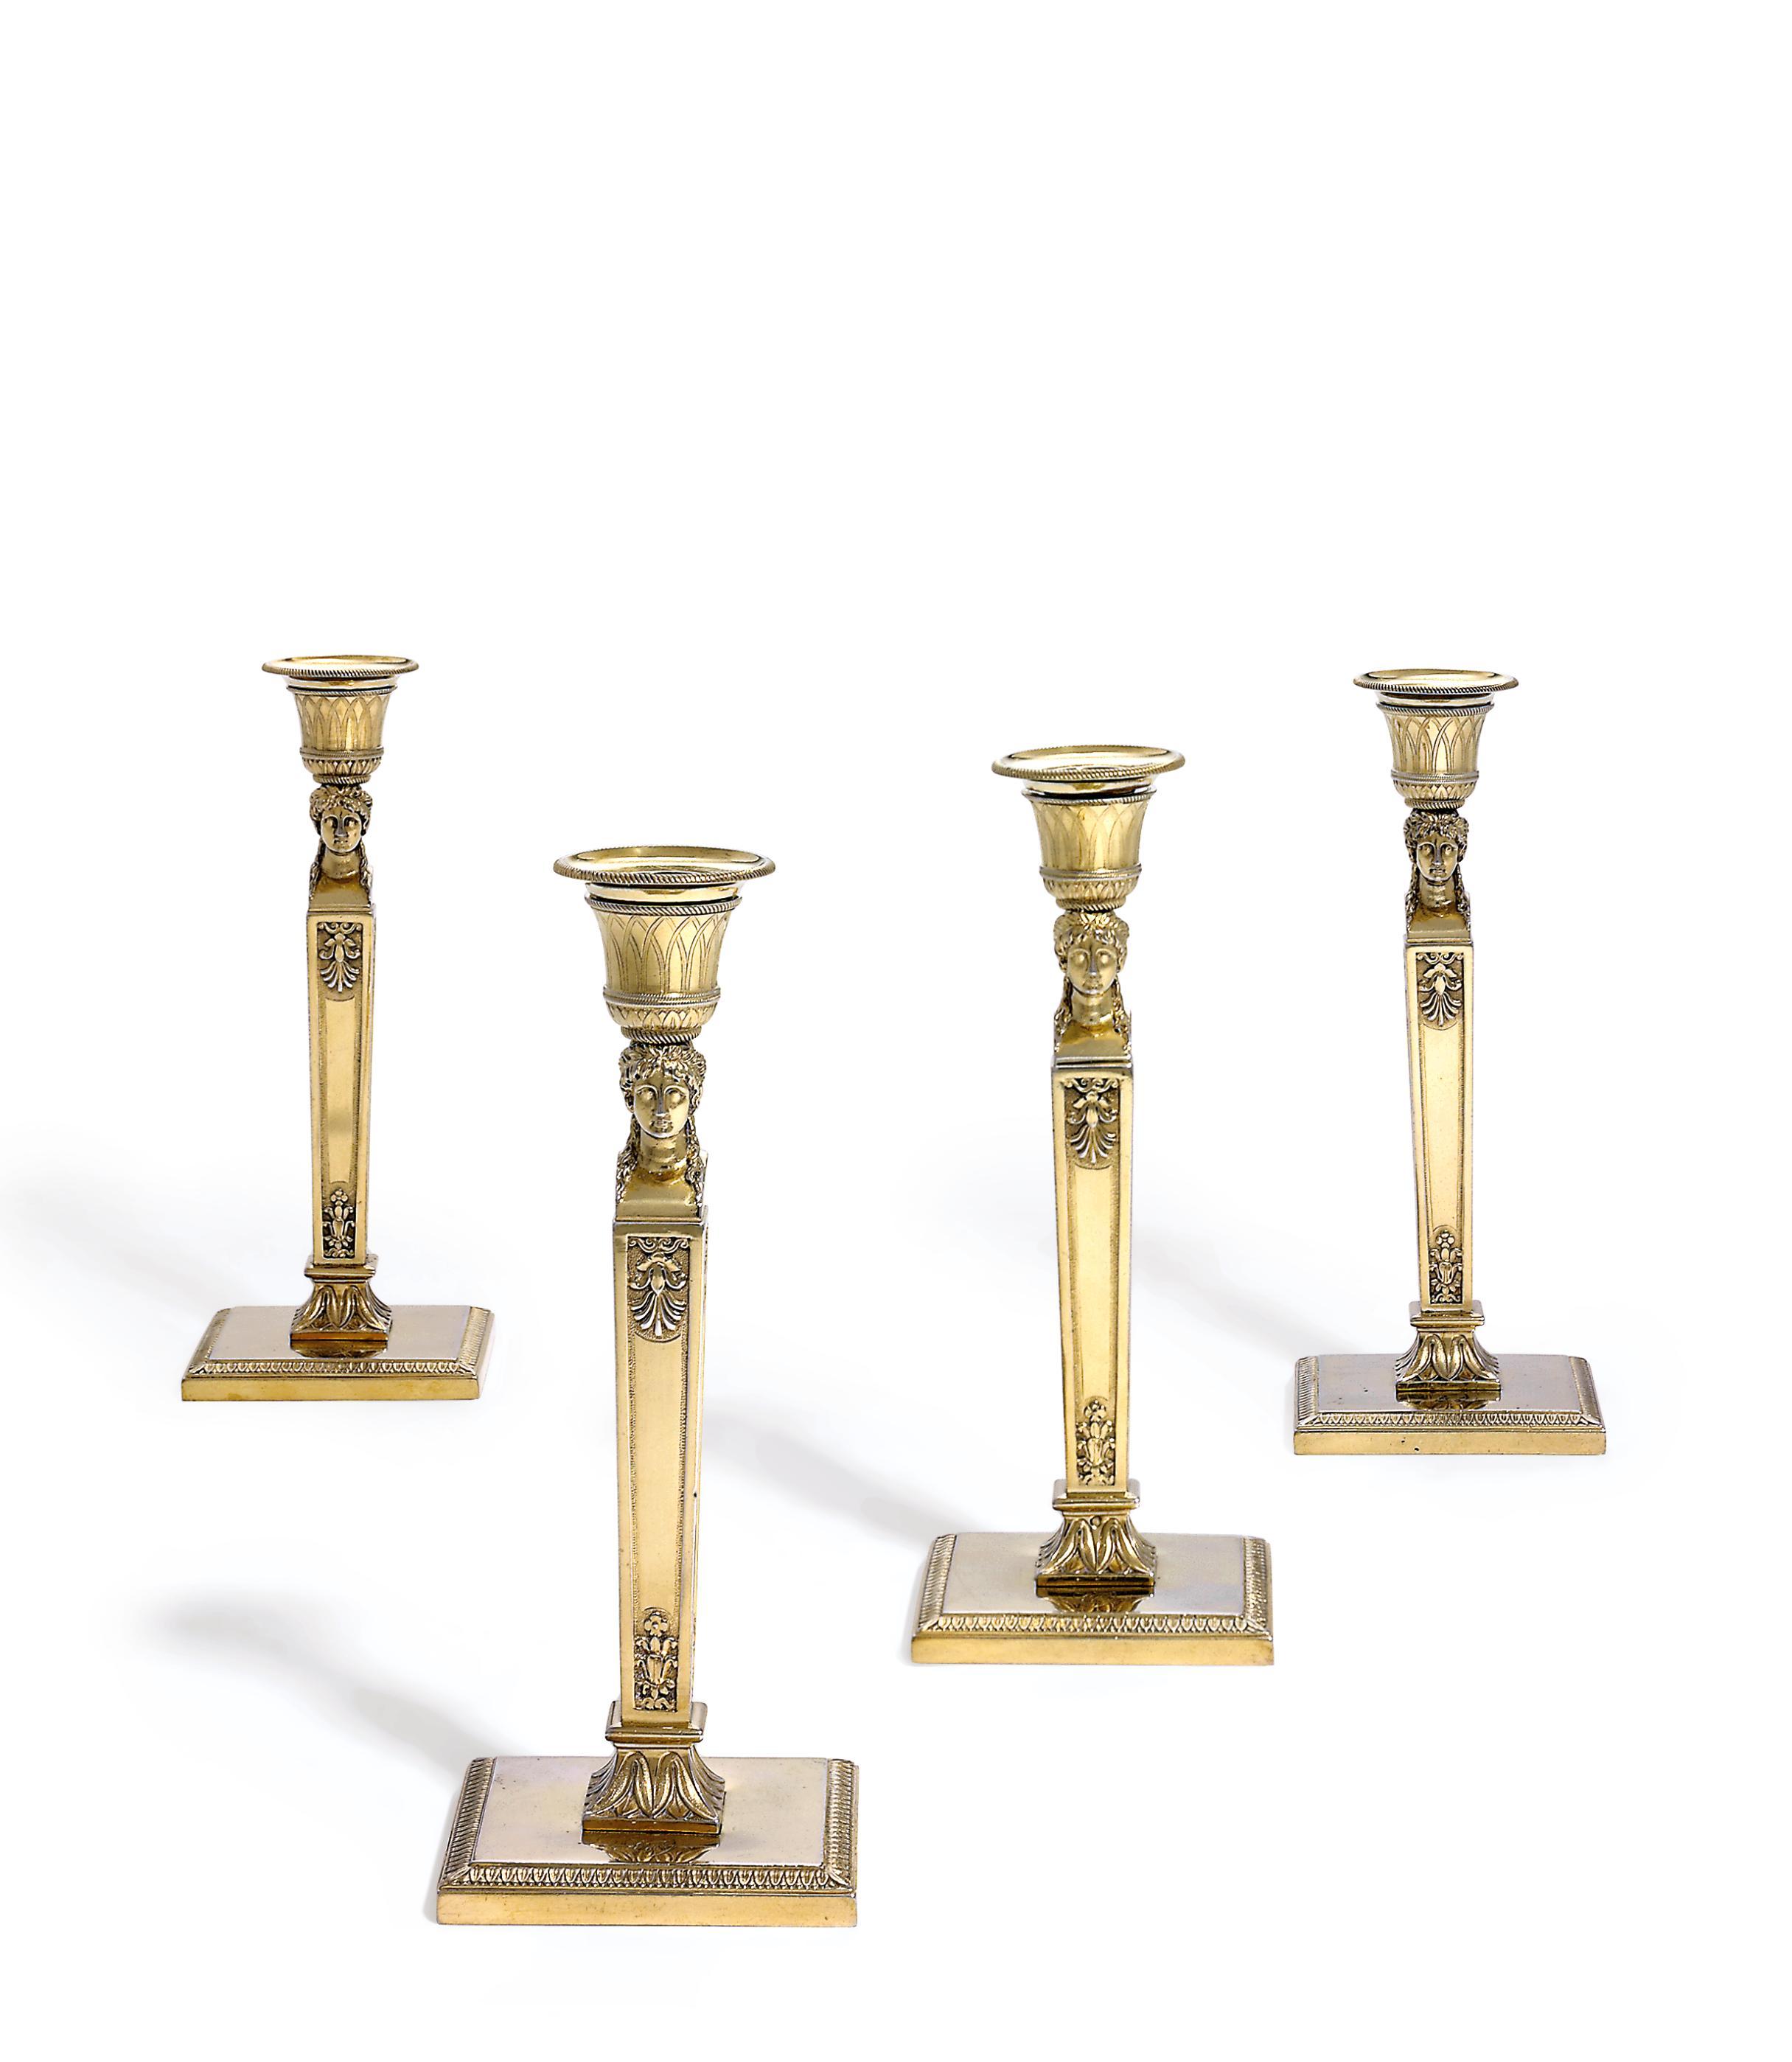 A SET OF FOUR FRENCH EMPIRE SILVER-GILT CANDLESTICKS